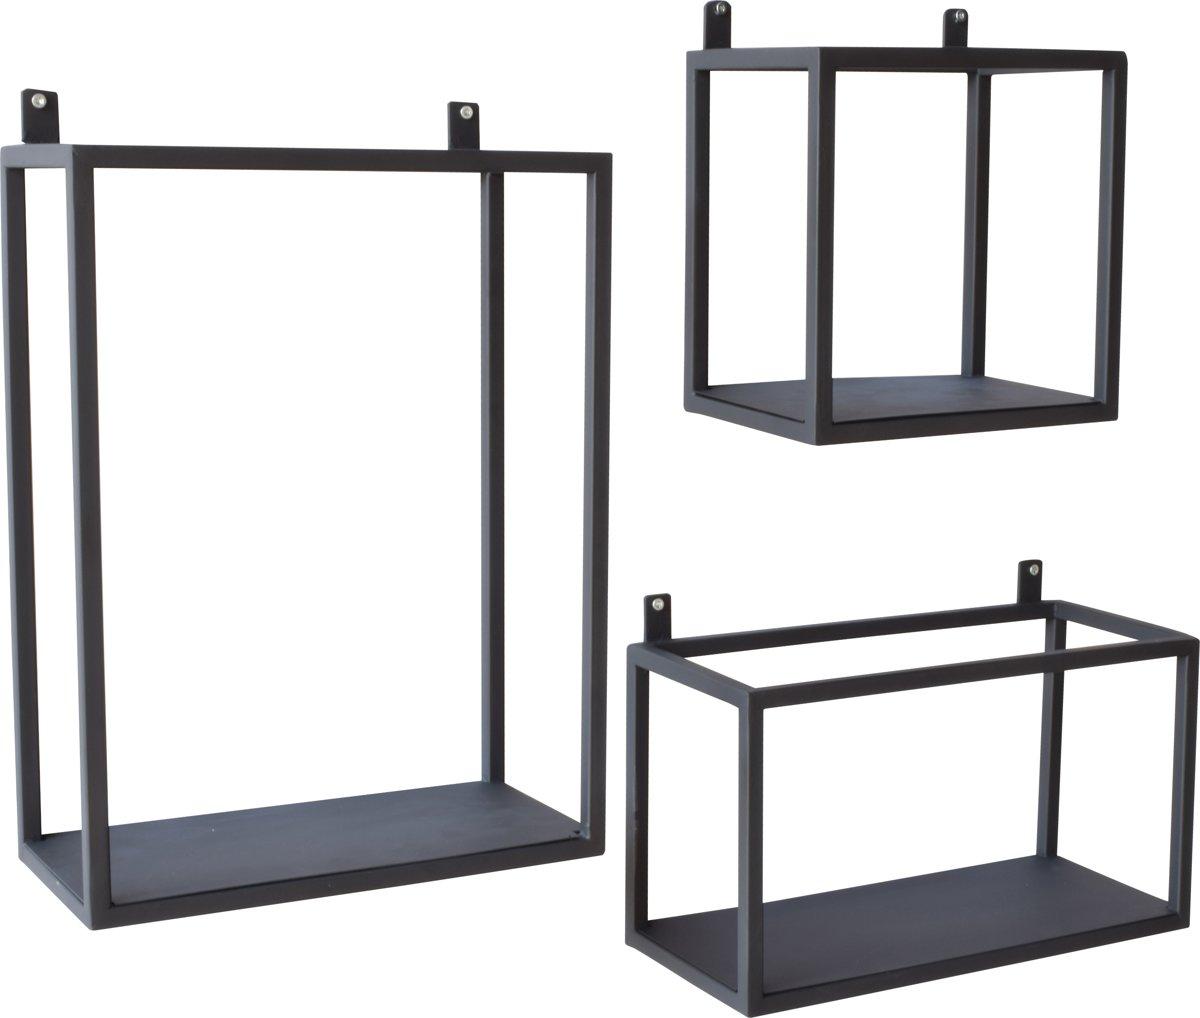 Urban Interiors - Wandkast - set van 3 - mat zwart kopen